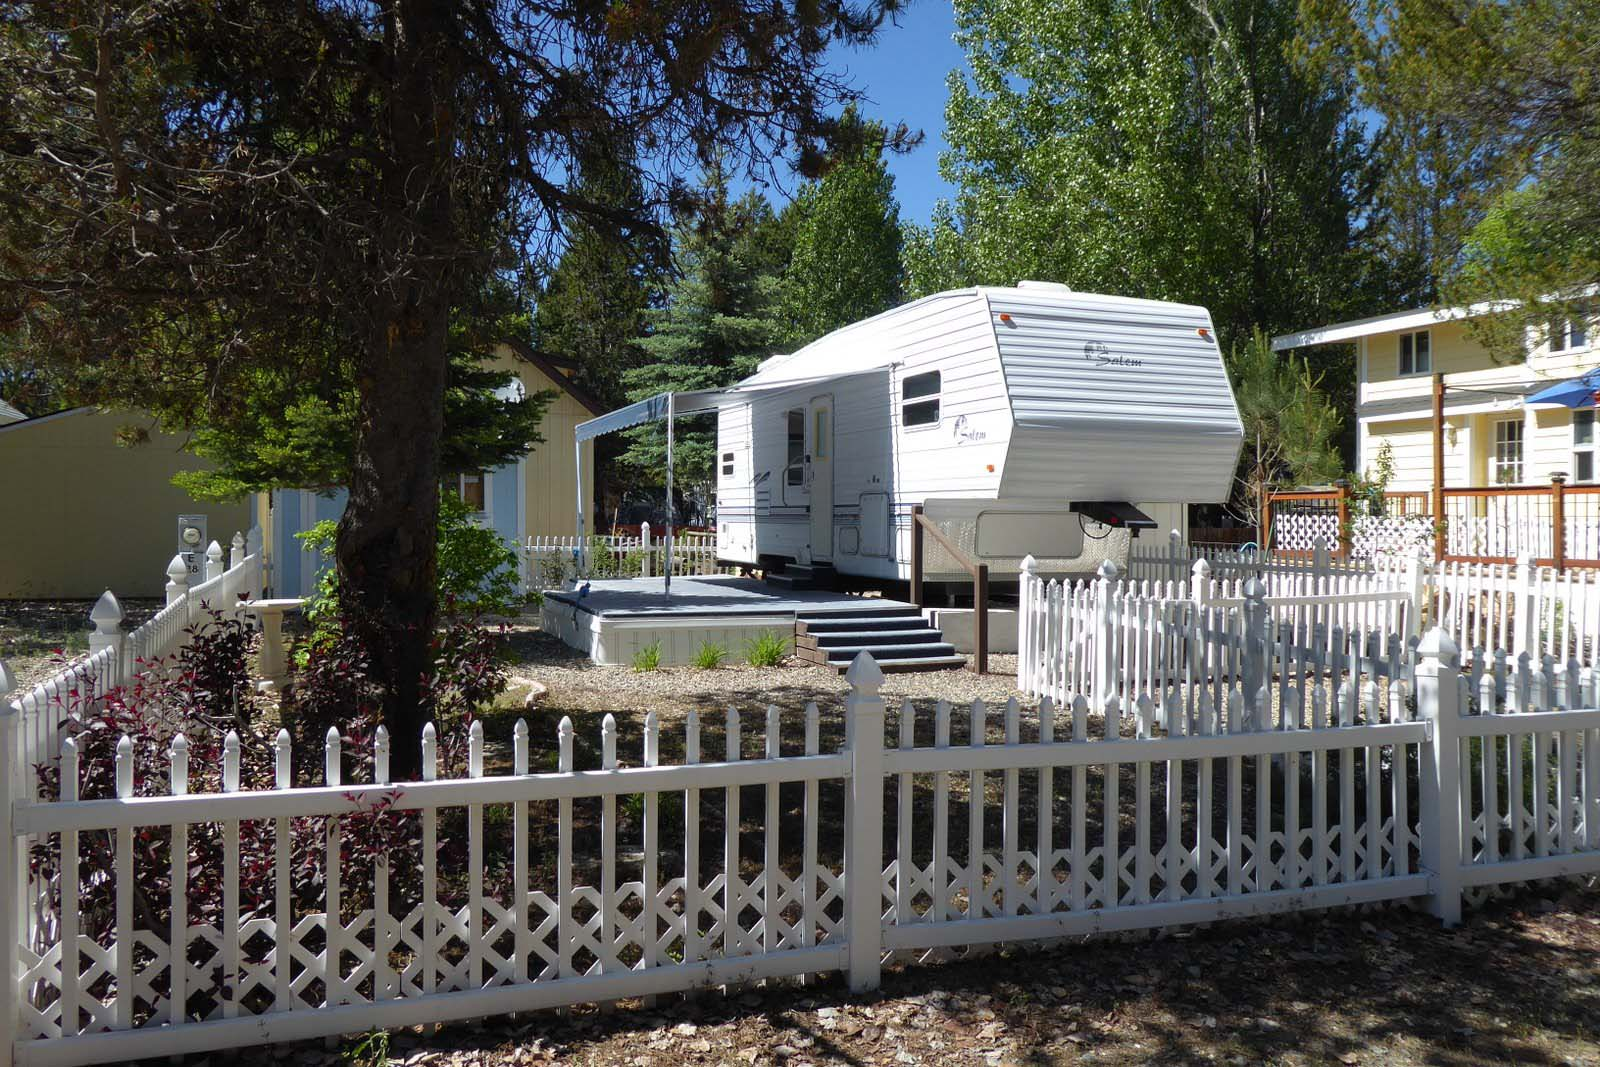 Cascade Lake Realty Leisure Time RV Park